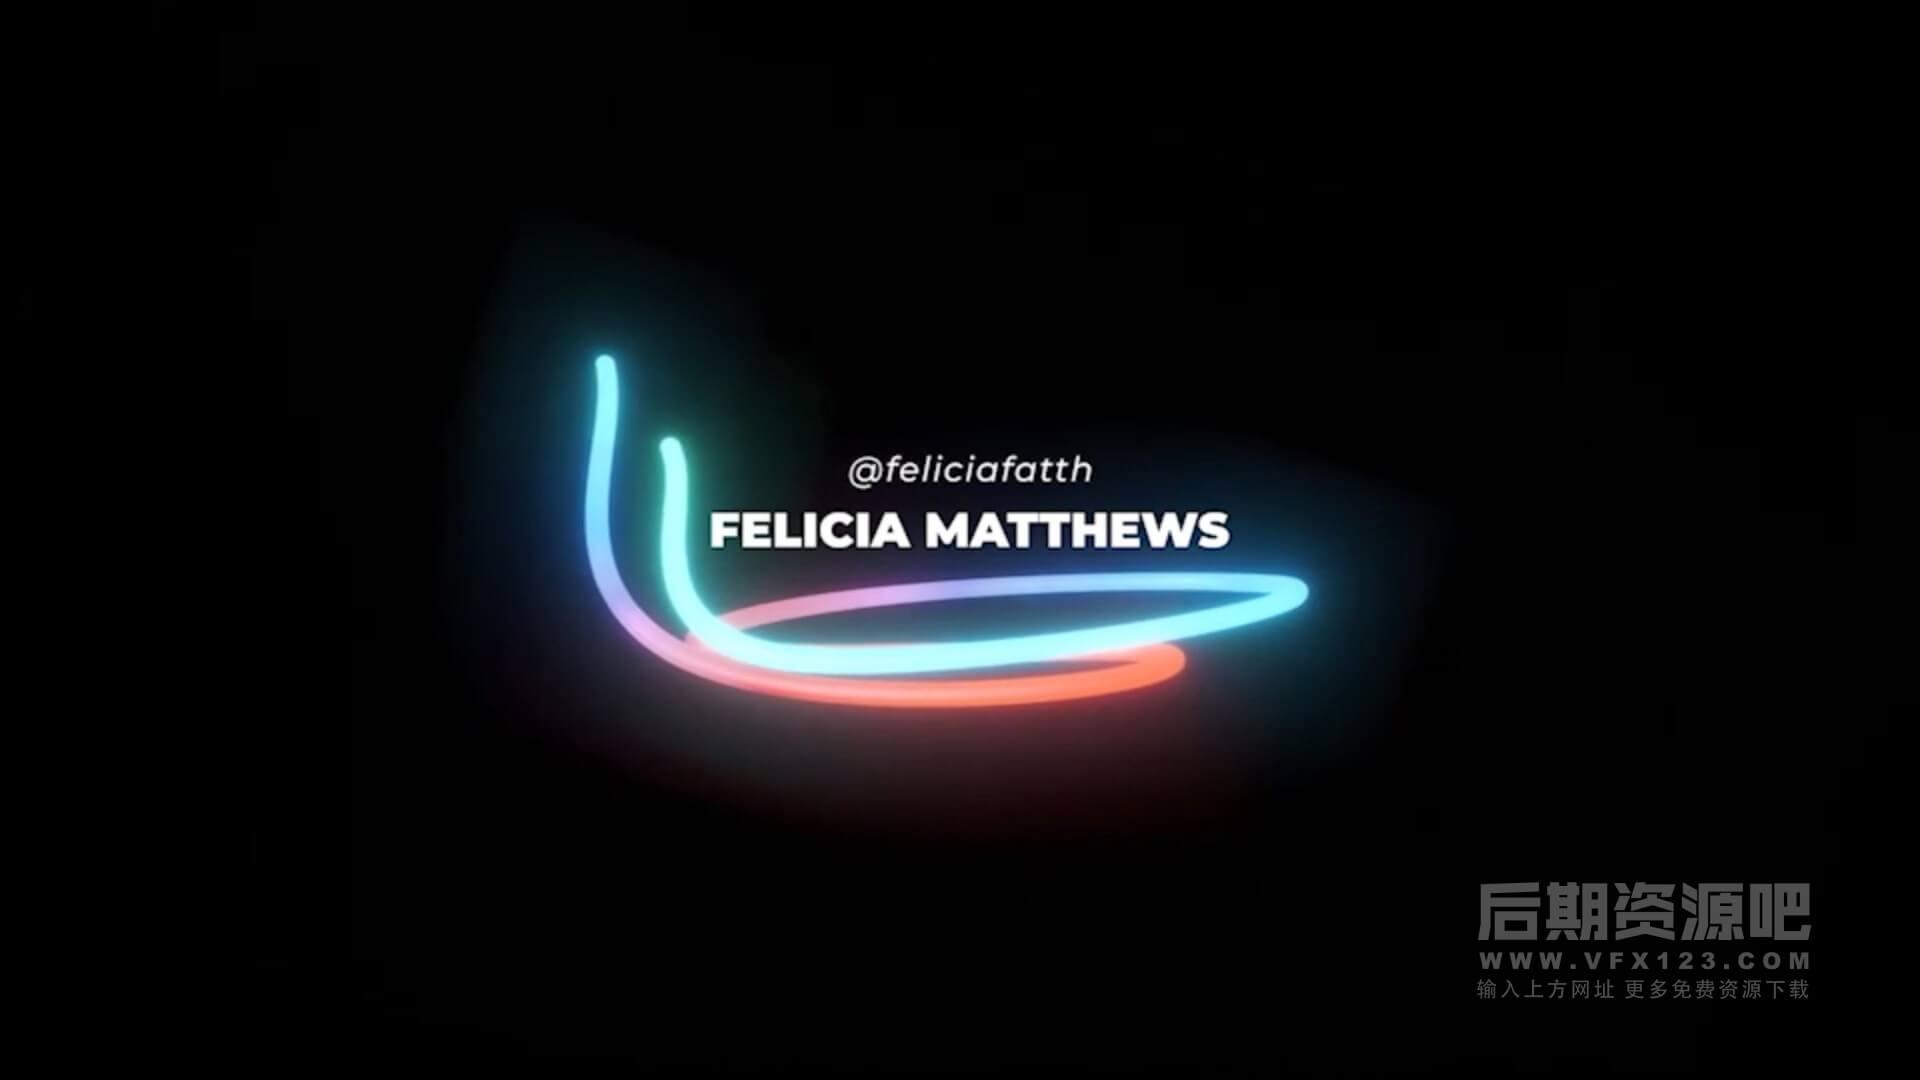 fcpx标题插件 16组时尚霓虹灯闪光效果标题模板 Lower Thirds Neon Titles